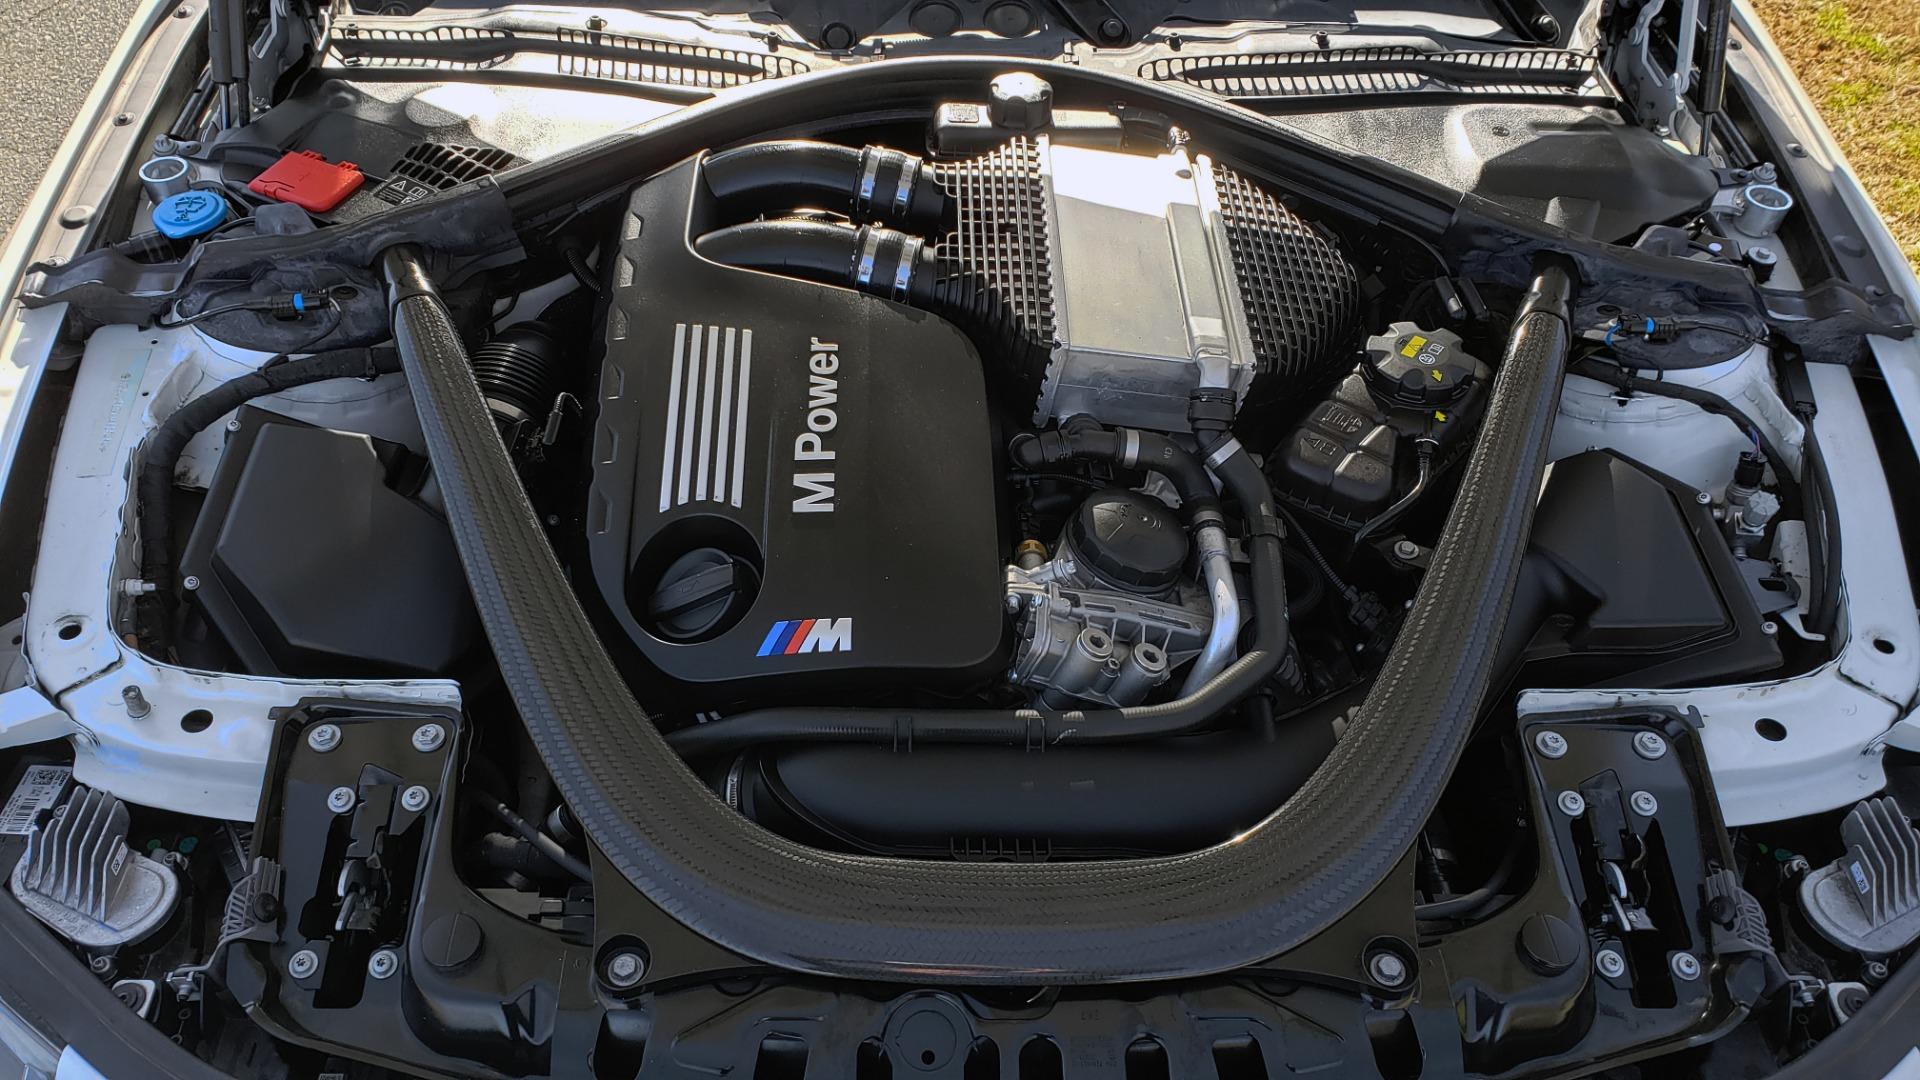 Used 2018 BMW M4 COMP PKG / EXEC / M-DRIVER / PARK CNTRL / ACTIVE BLIND SPOT for sale Sold at Formula Imports in Charlotte NC 28227 19